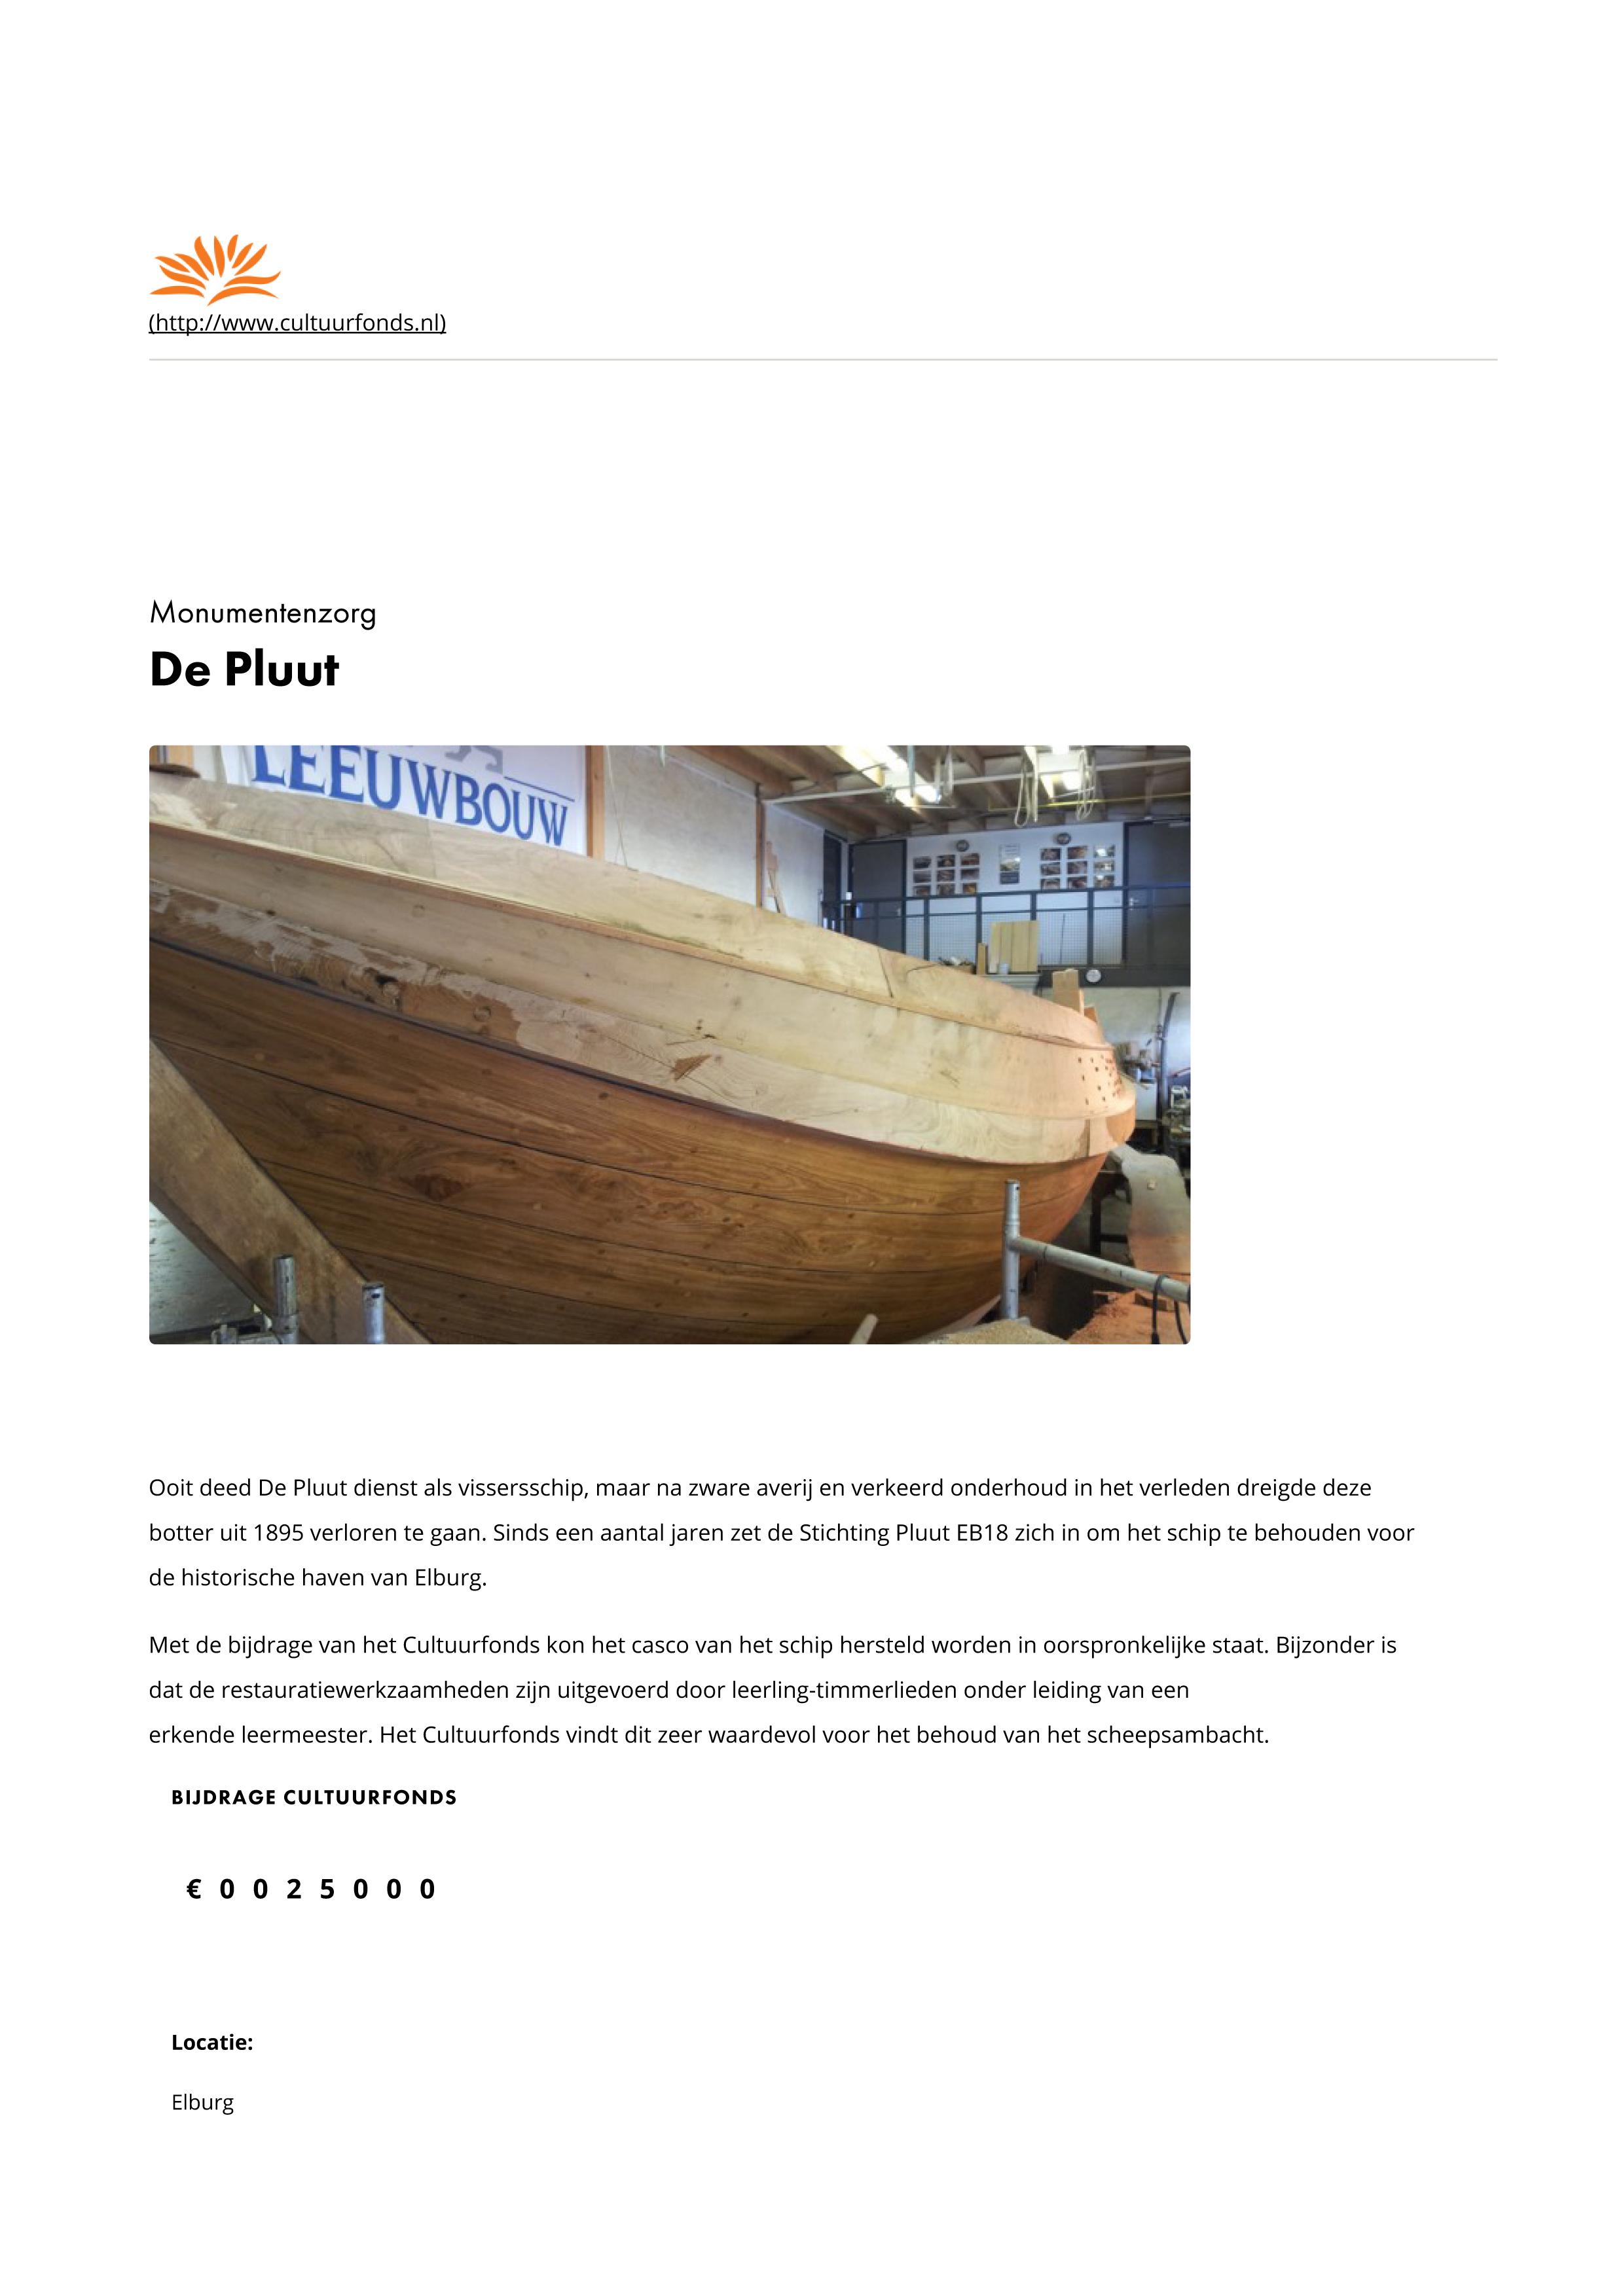 De Pluut - Prins Bernhard Cultuurfonds-1